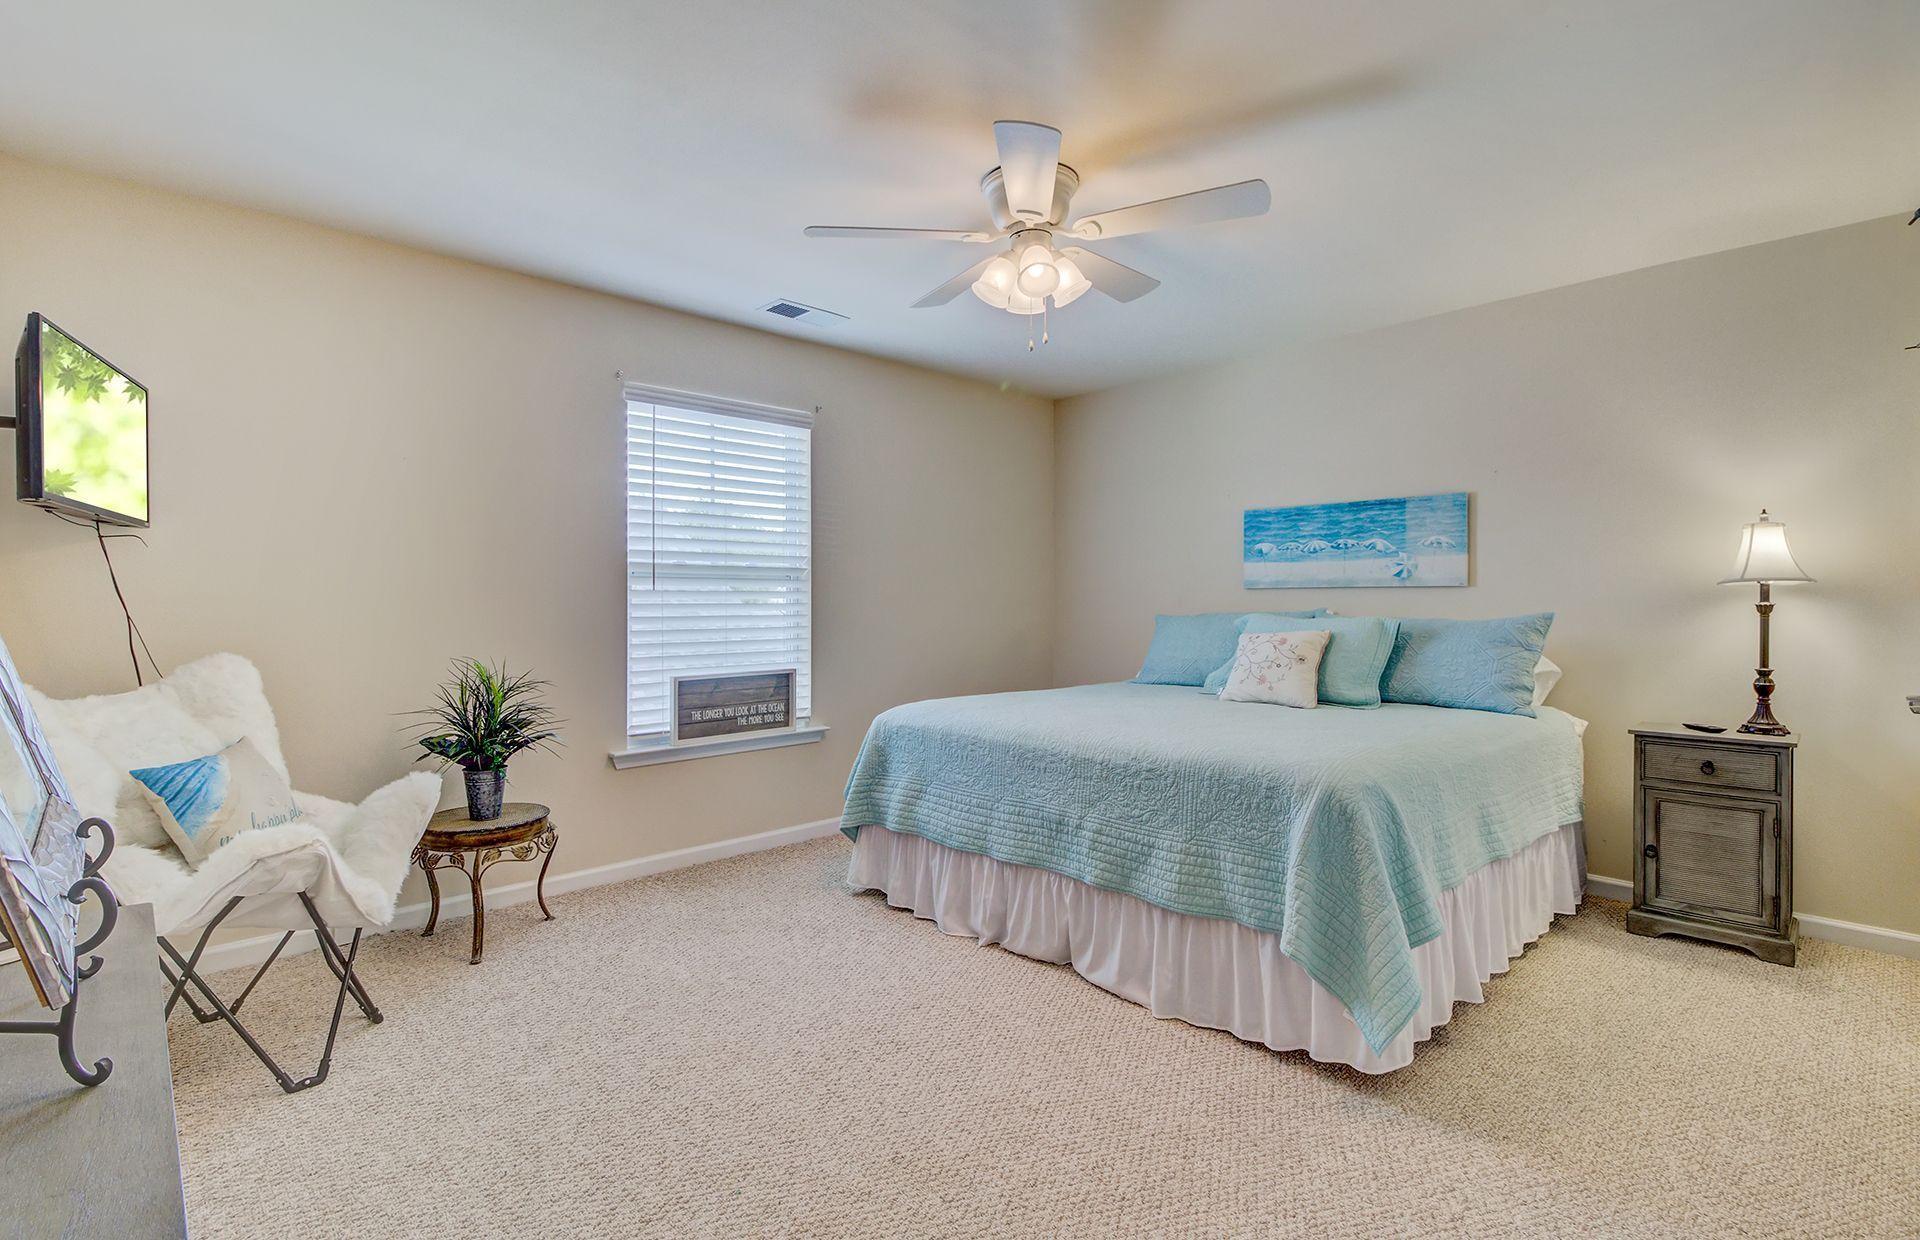 Linnen Place Homes For Sale - 1275 Shingleback, Mount Pleasant, SC - 11